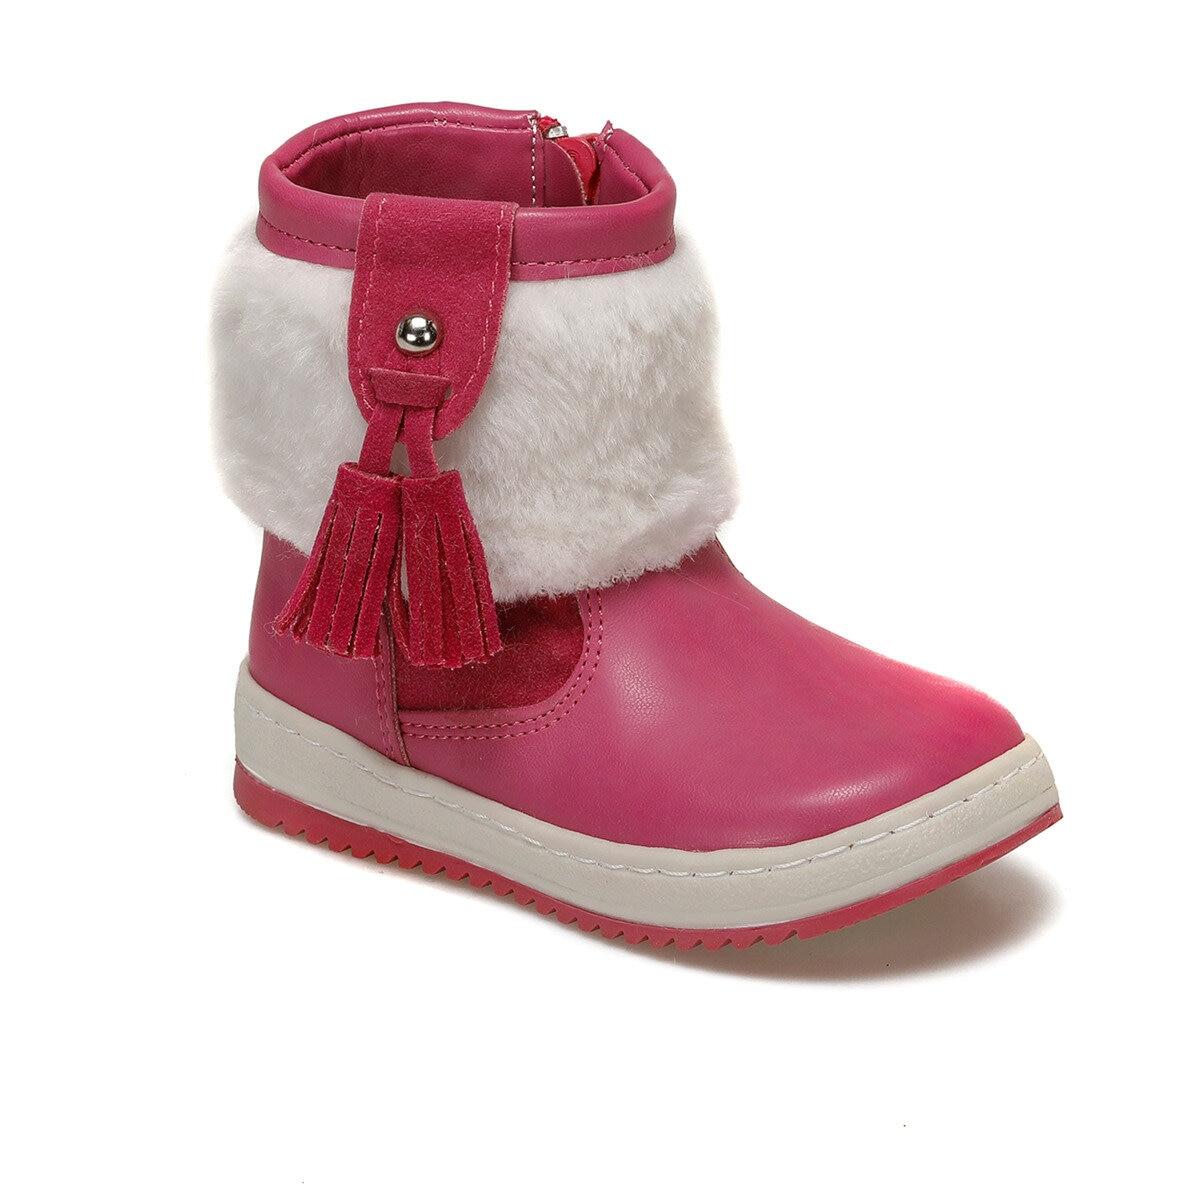 FLO-أحذية بولاريس الكلاسيكية للأطفال ، أحذية فوشيا 72.509537.B